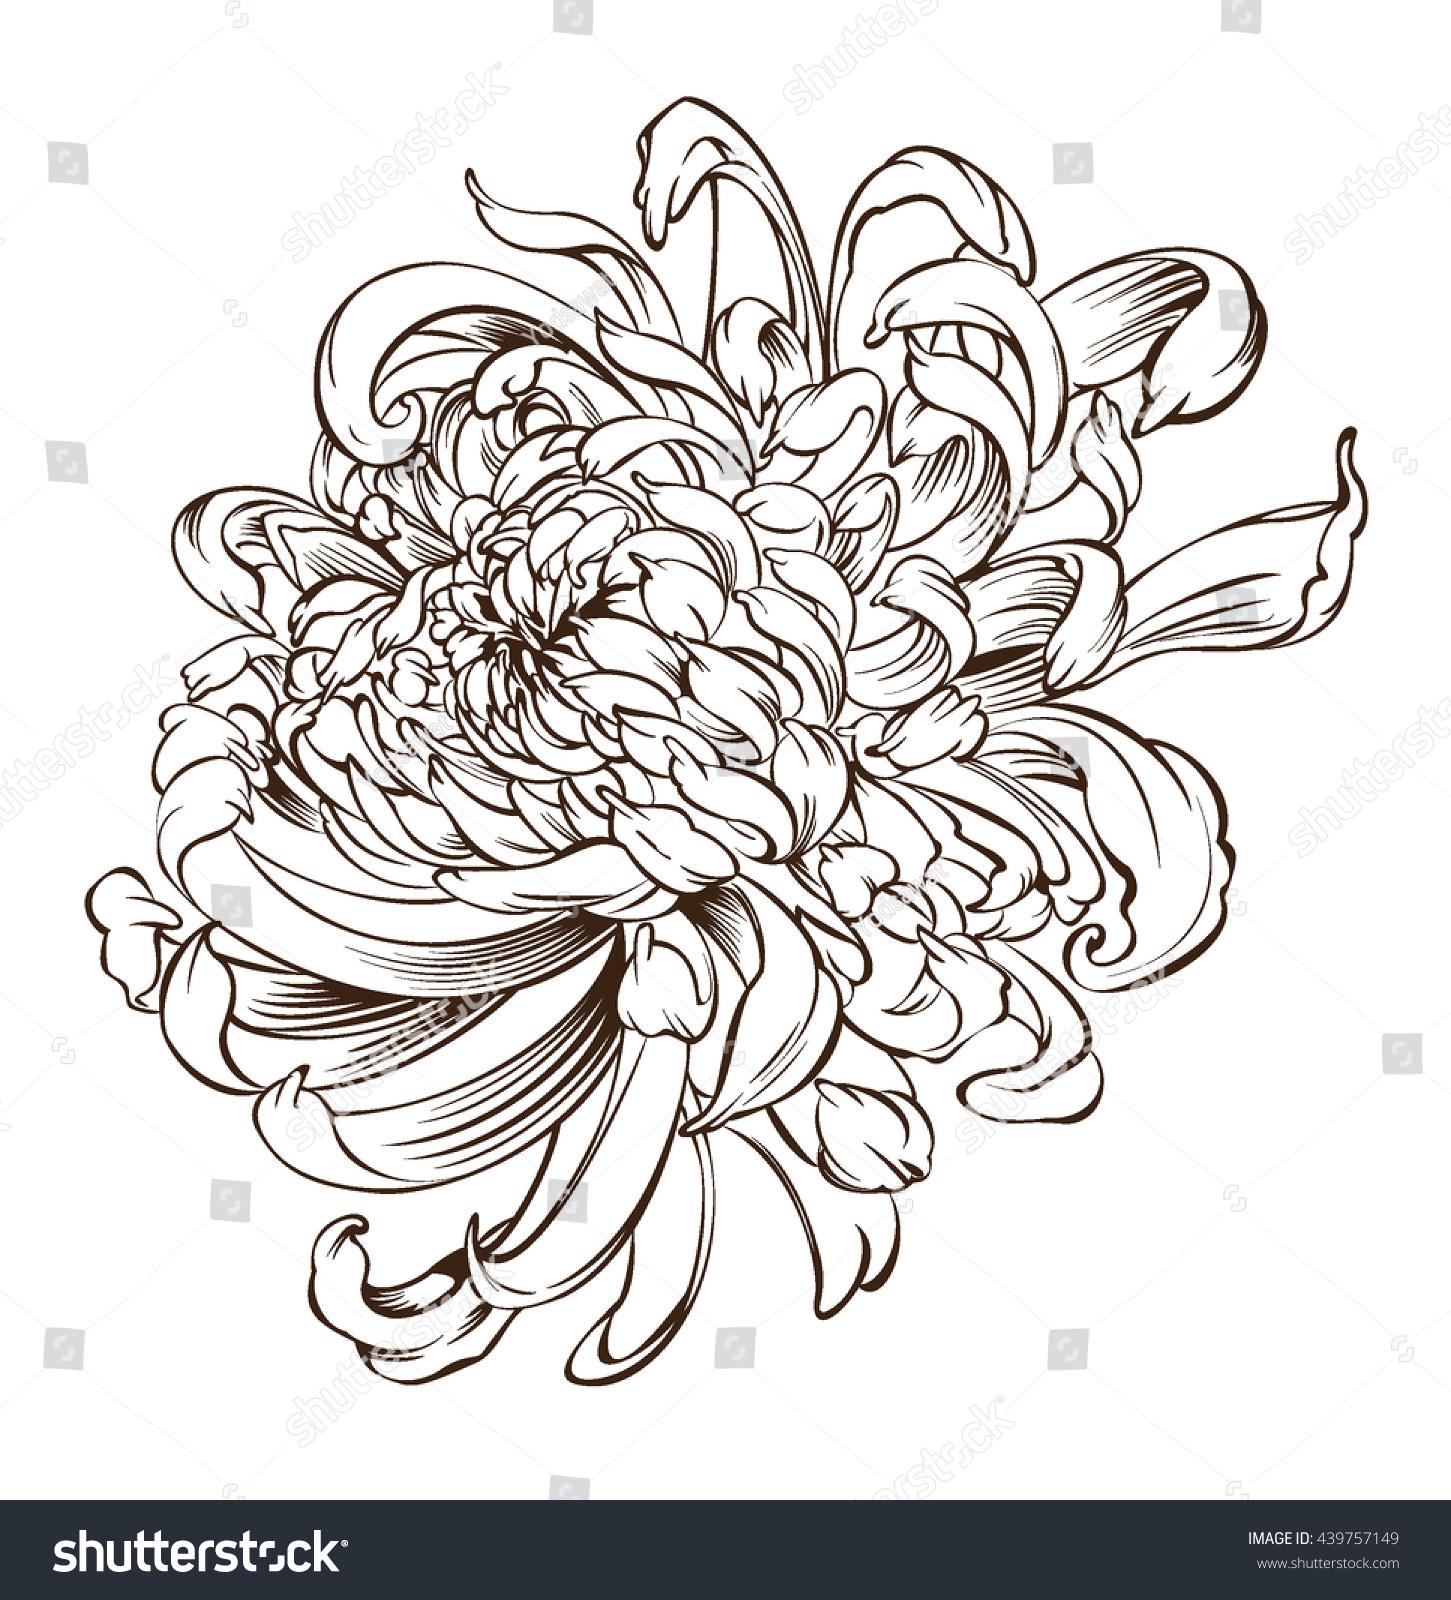 Japanese Flower Line Drawing : Japanese flower tattoo chrysanthemum blossoms stock